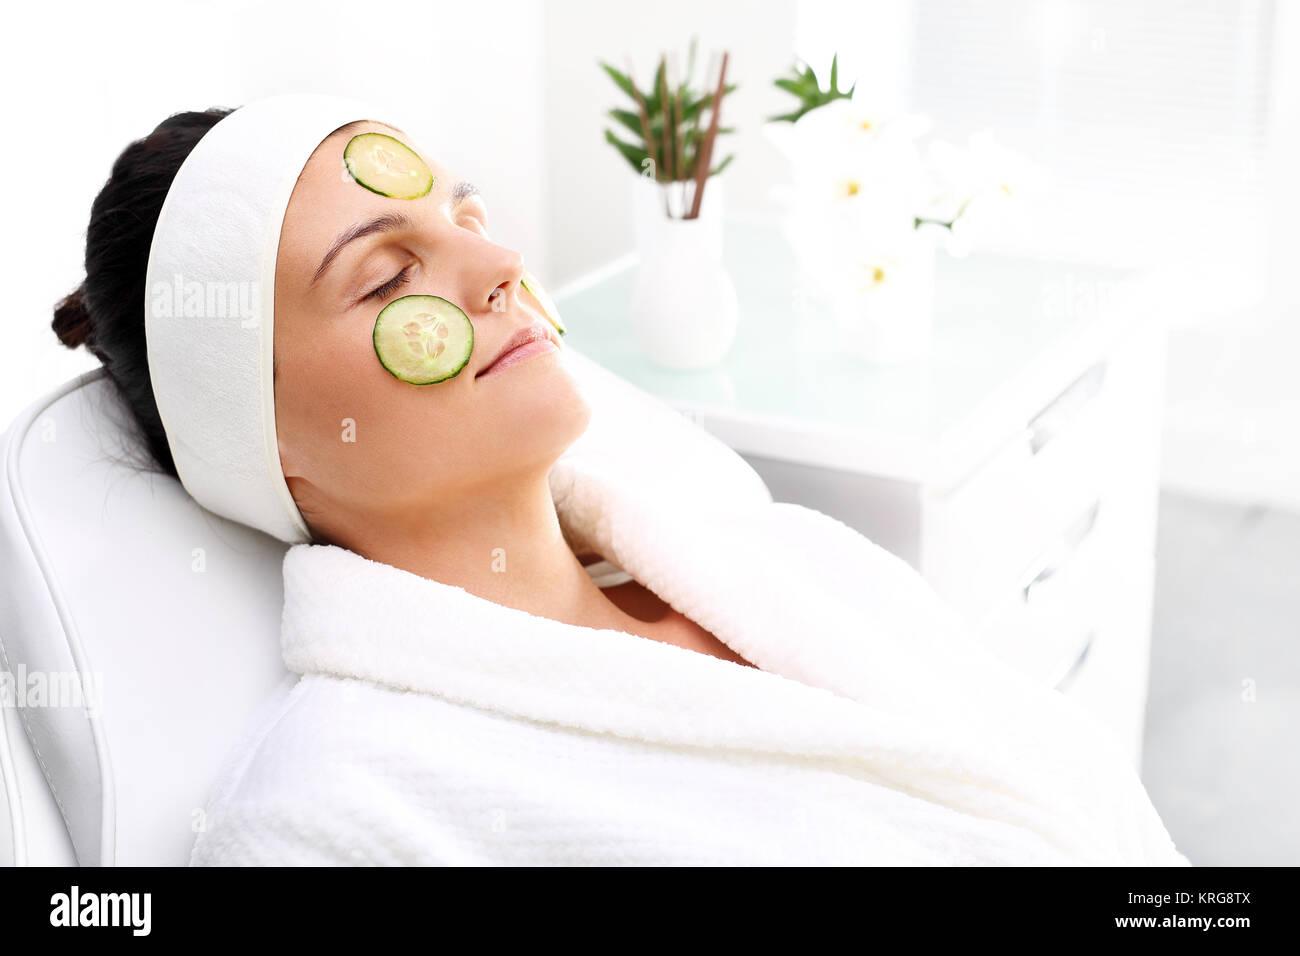 Cucumber Mask. Hautpflege Behandlung im Schönheitssalon Stockbild